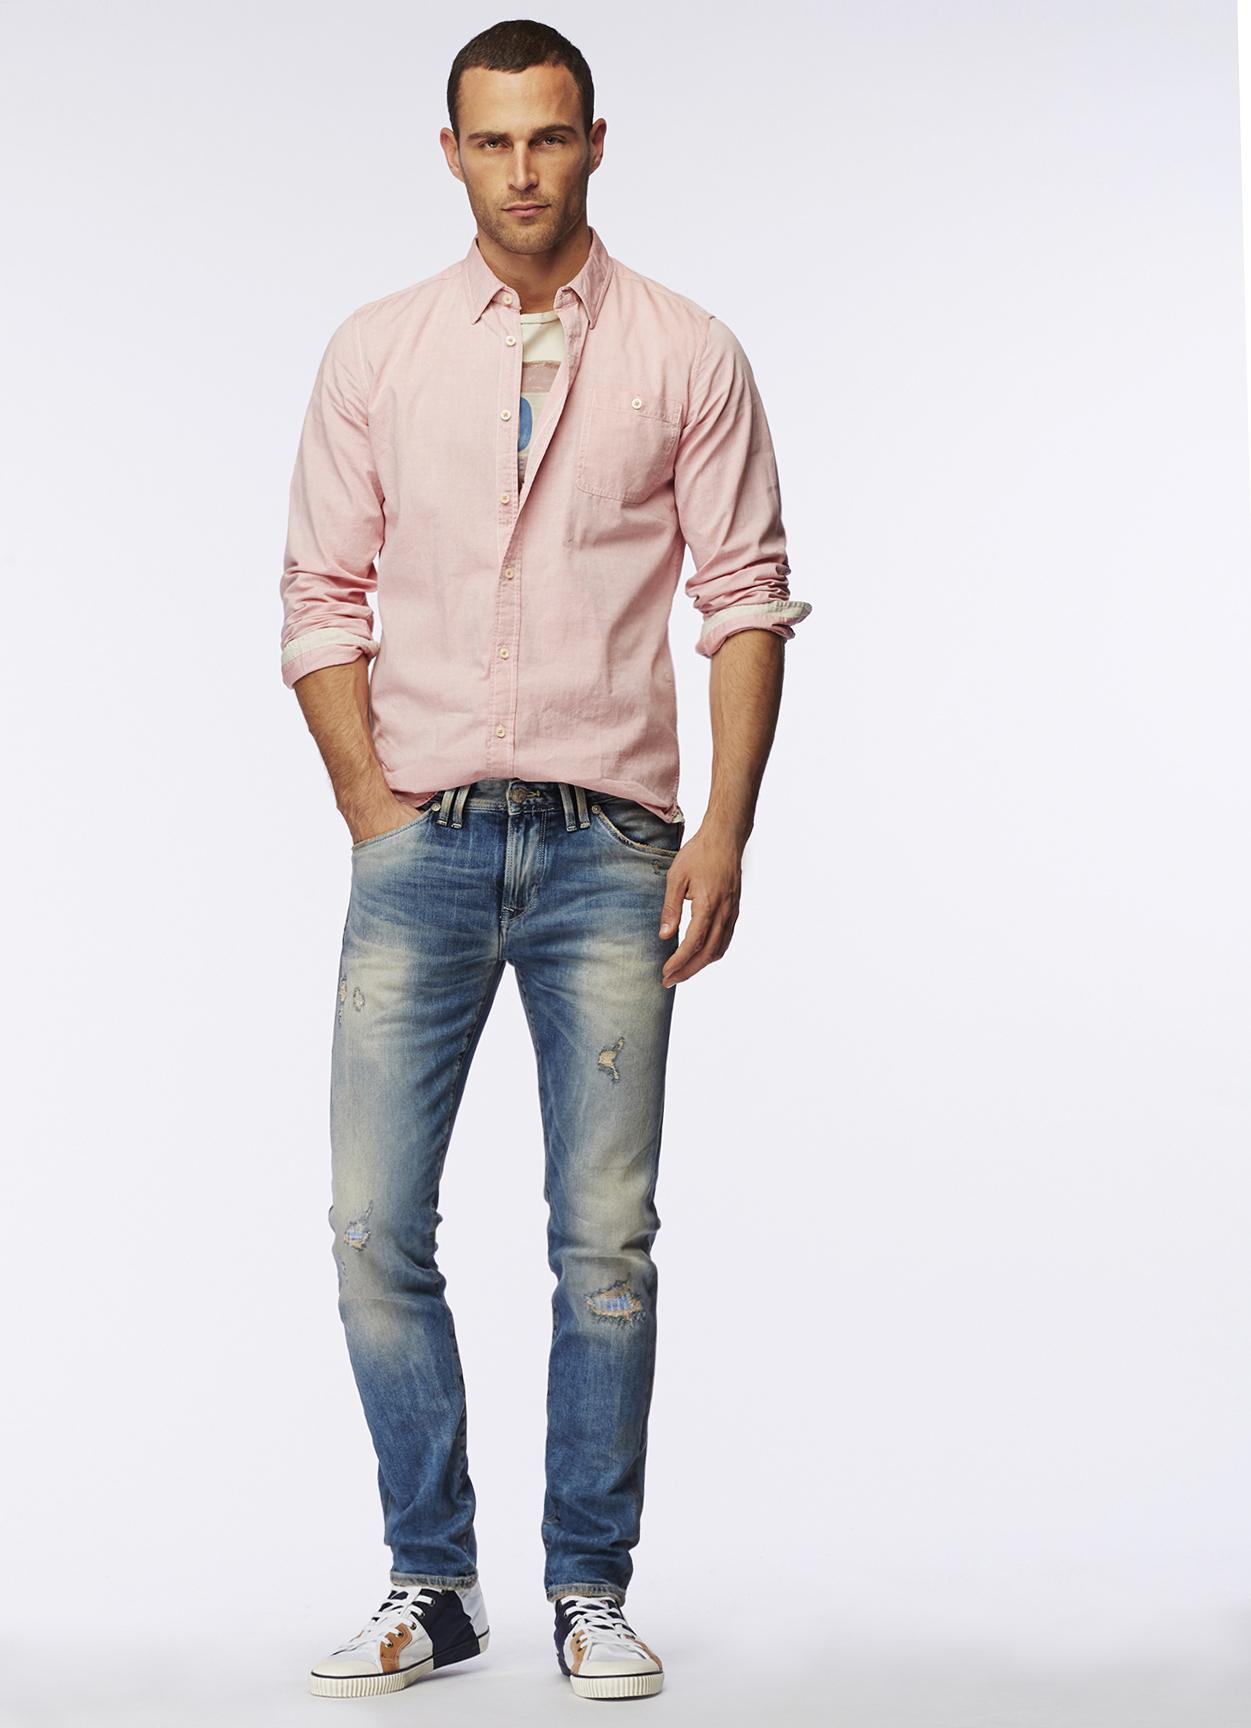 Shop Phan_3t Hàng VNXK origianal !!Zara,celio,nautica,raul lauren...Giá tốt nhất!! - 12